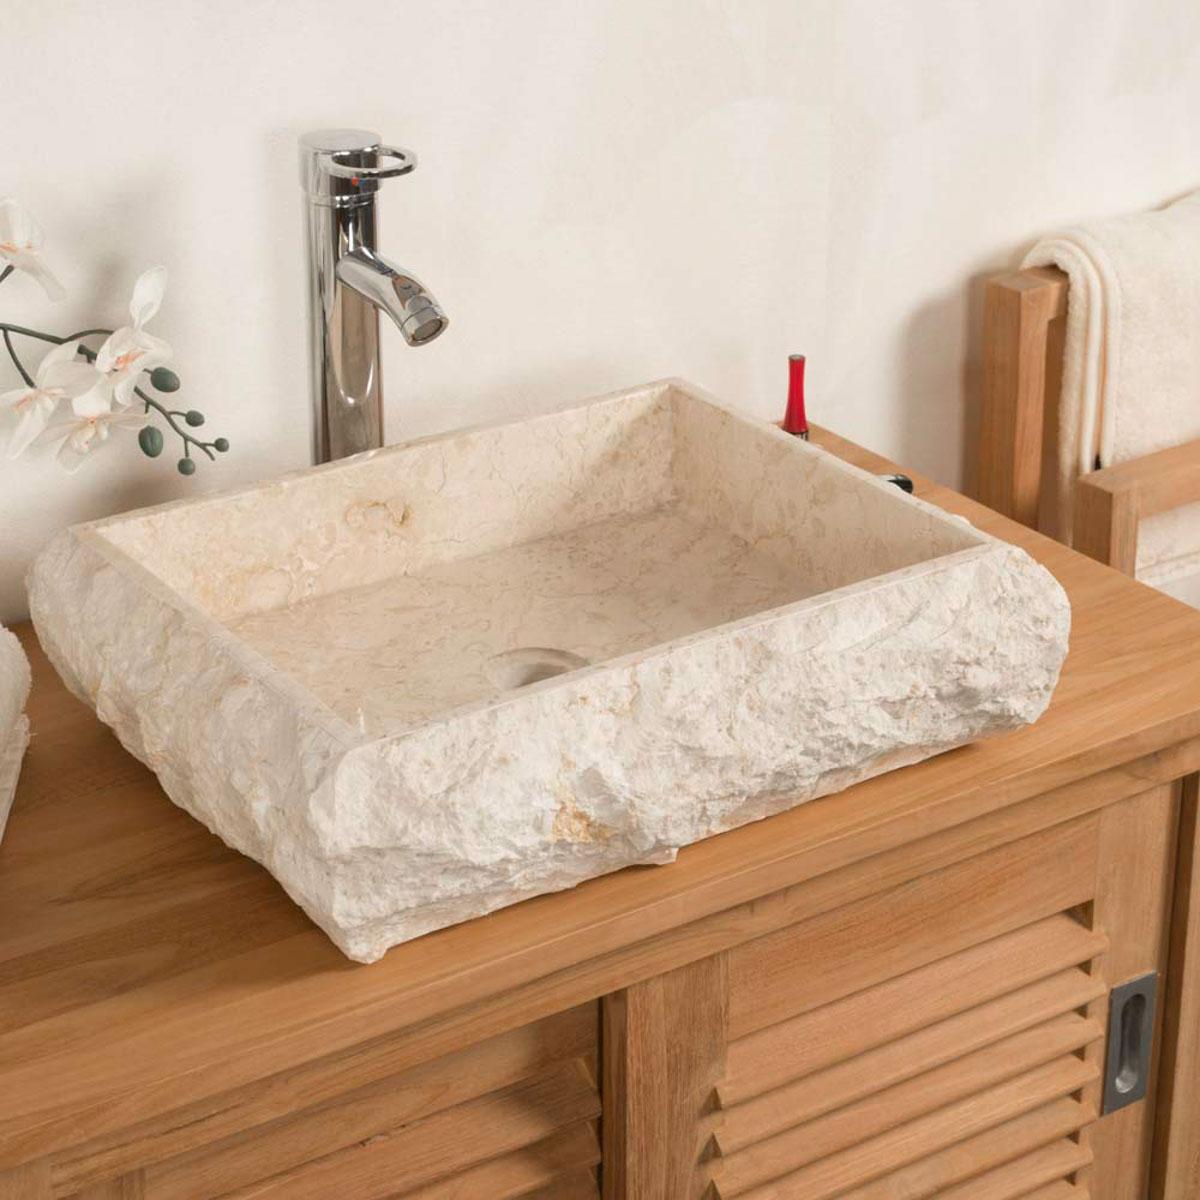 vasque poser en marbre naples rectangle cr me d 50 cm. Black Bedroom Furniture Sets. Home Design Ideas